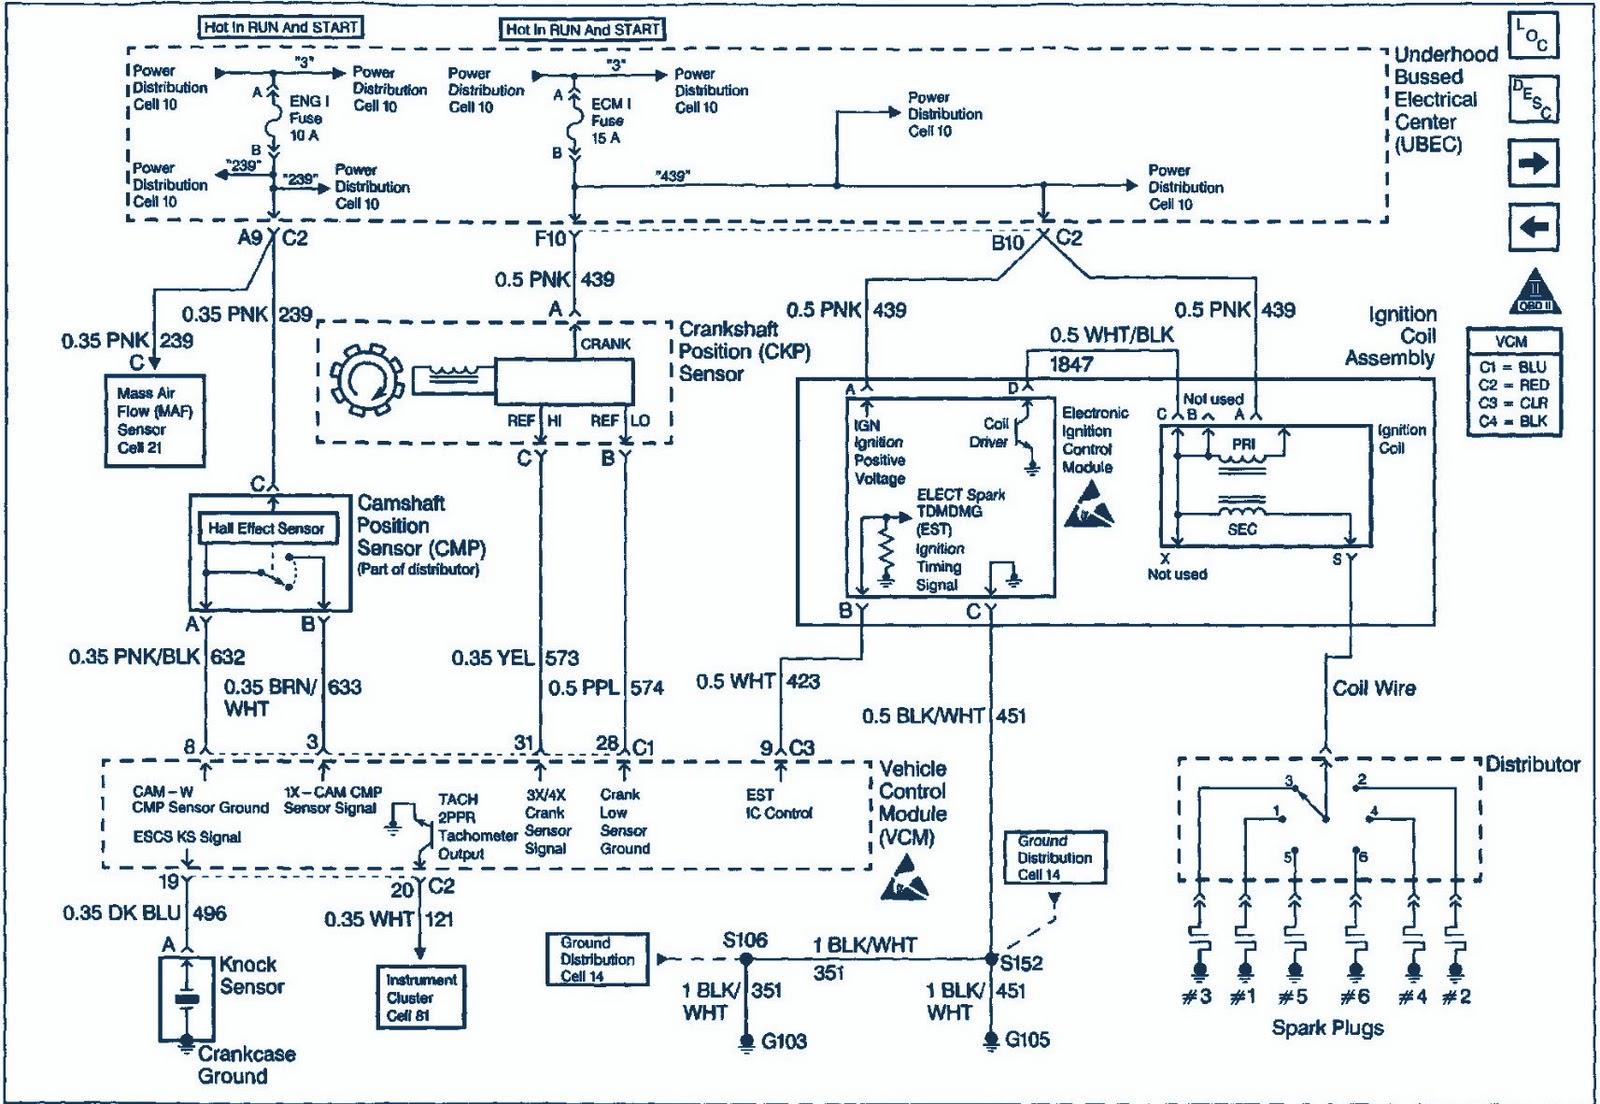 1998+Gmc+Jimmy+Wiring+Diagram?h=125 dodge ram radio wiring diagram dodge ram infinity system wiring on 2006 dodge ram 1500 radio wiring diagram